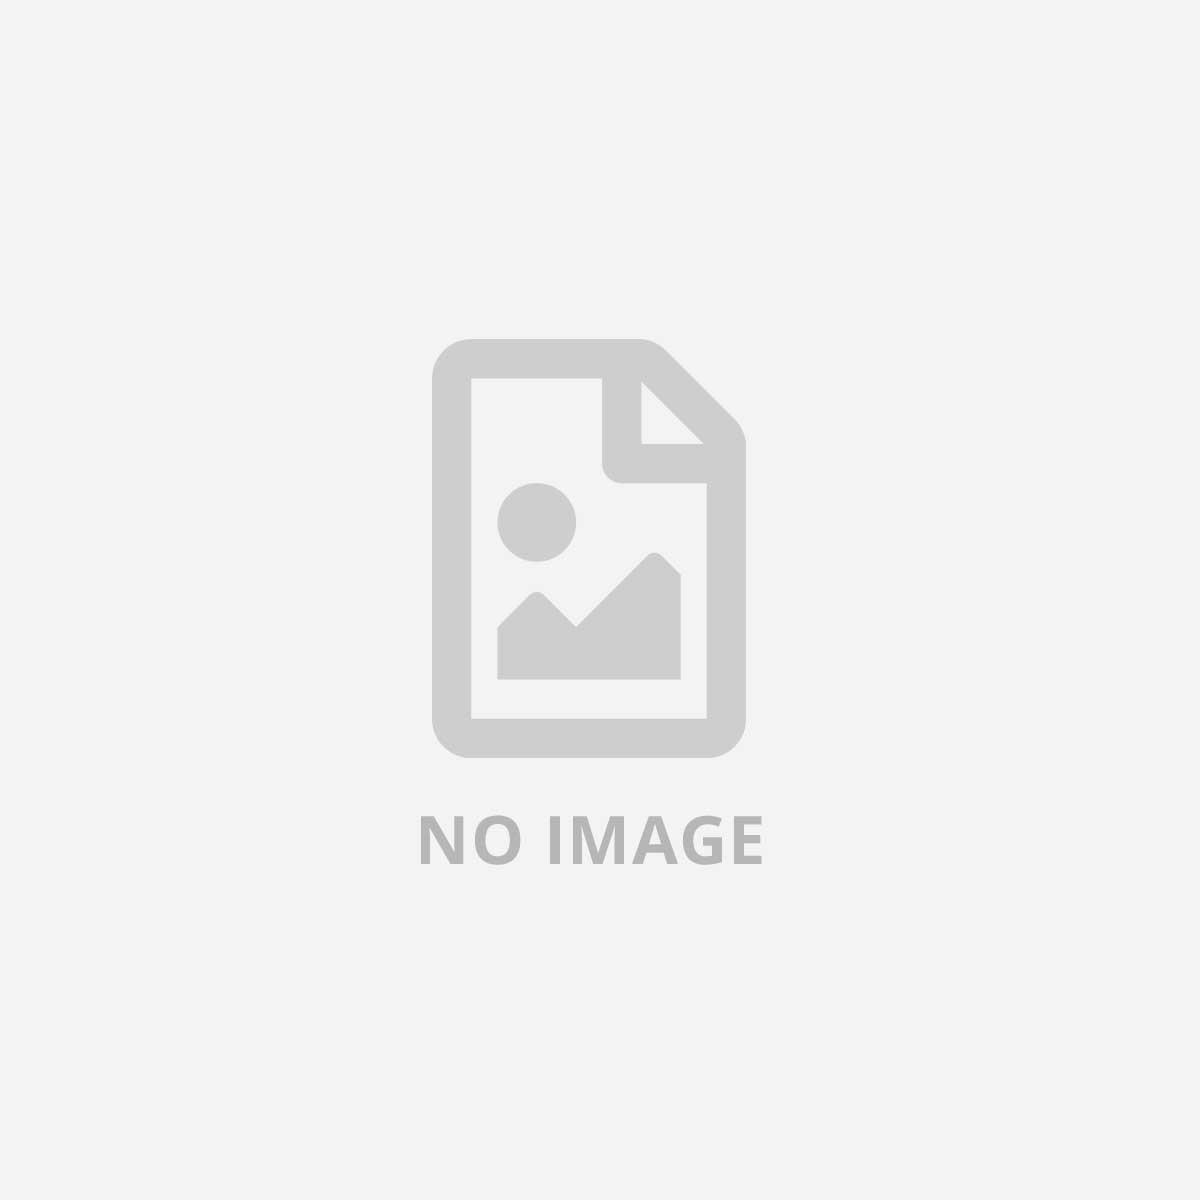 WATCHGUARD PANDA ADAPTIVE DEFENSE 360 PER M